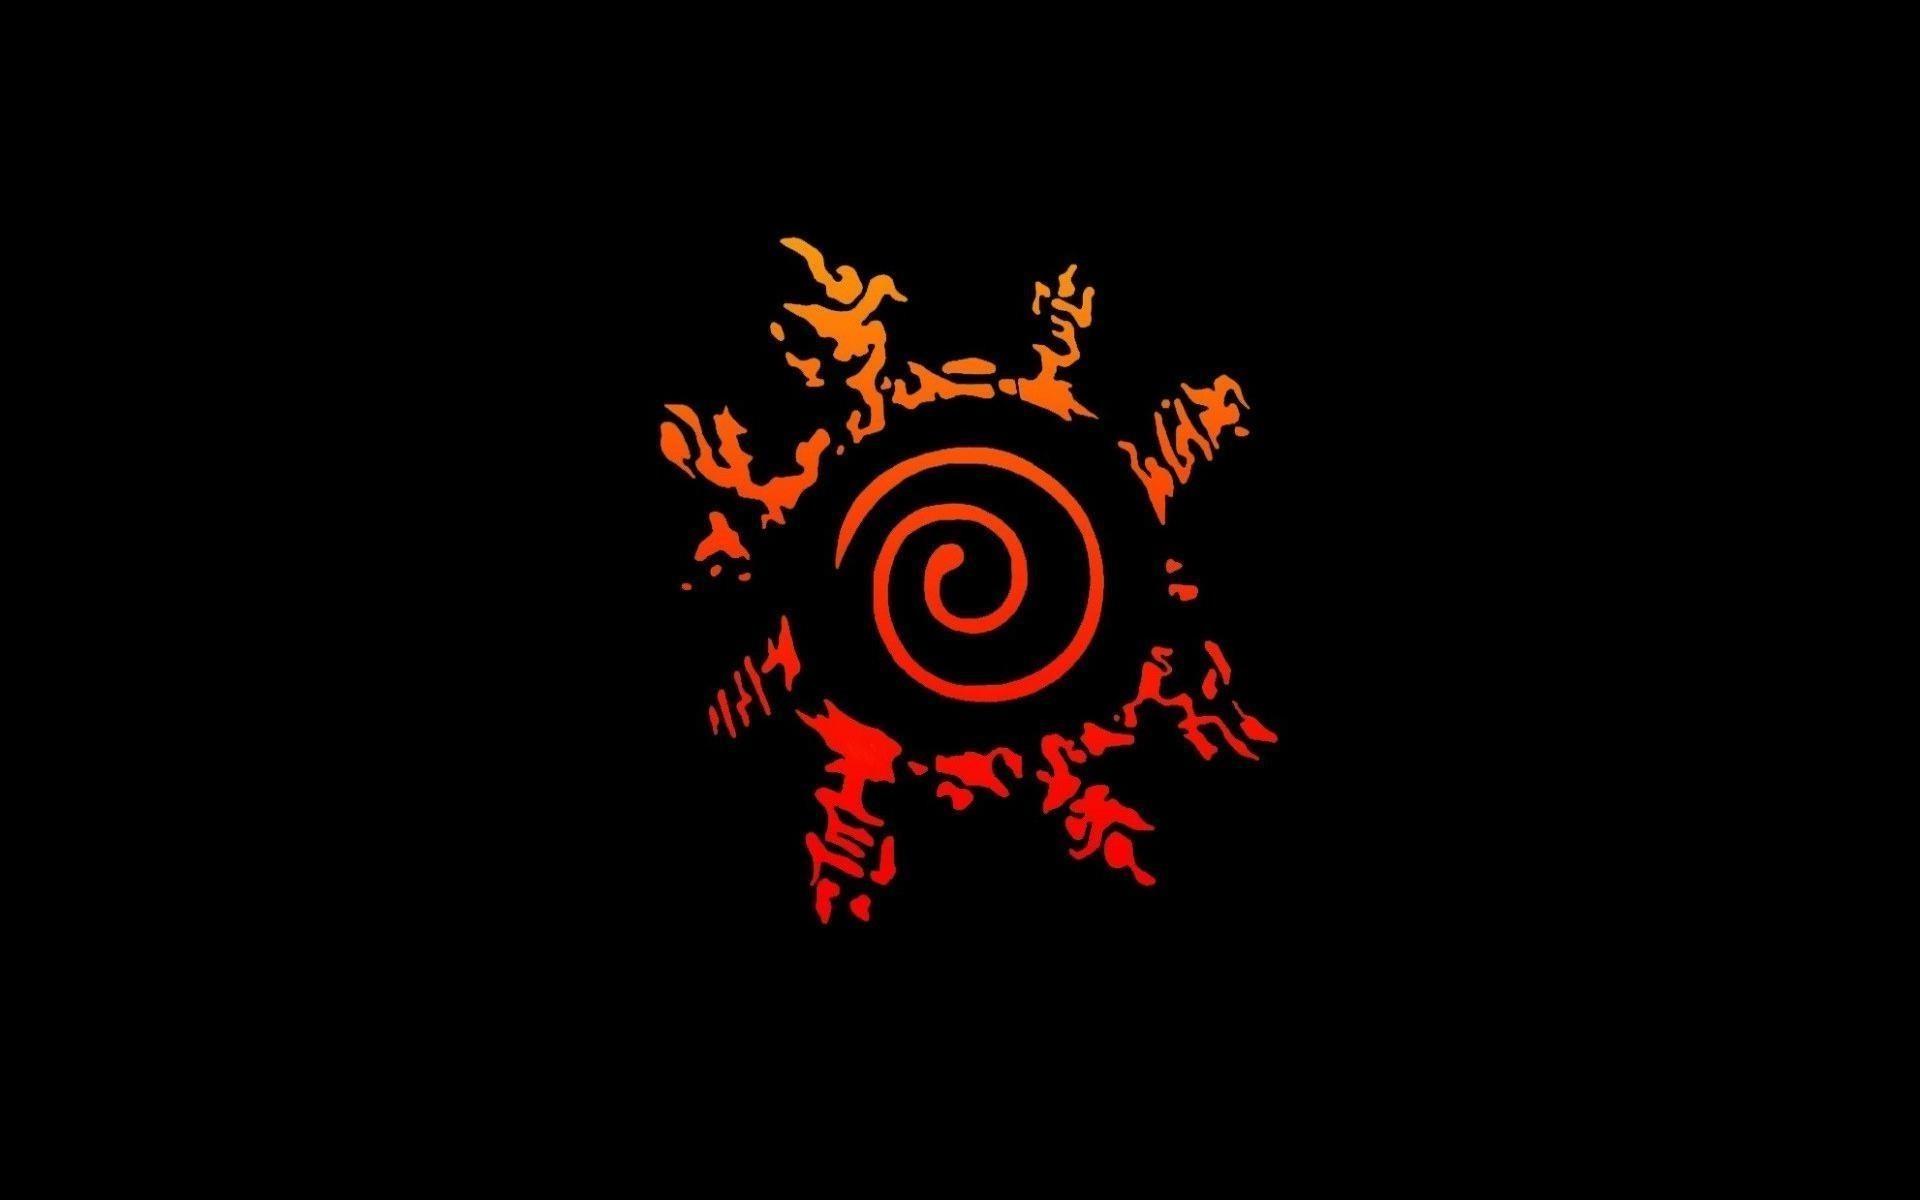 Anime Symbols Wallpaper (77+ Images